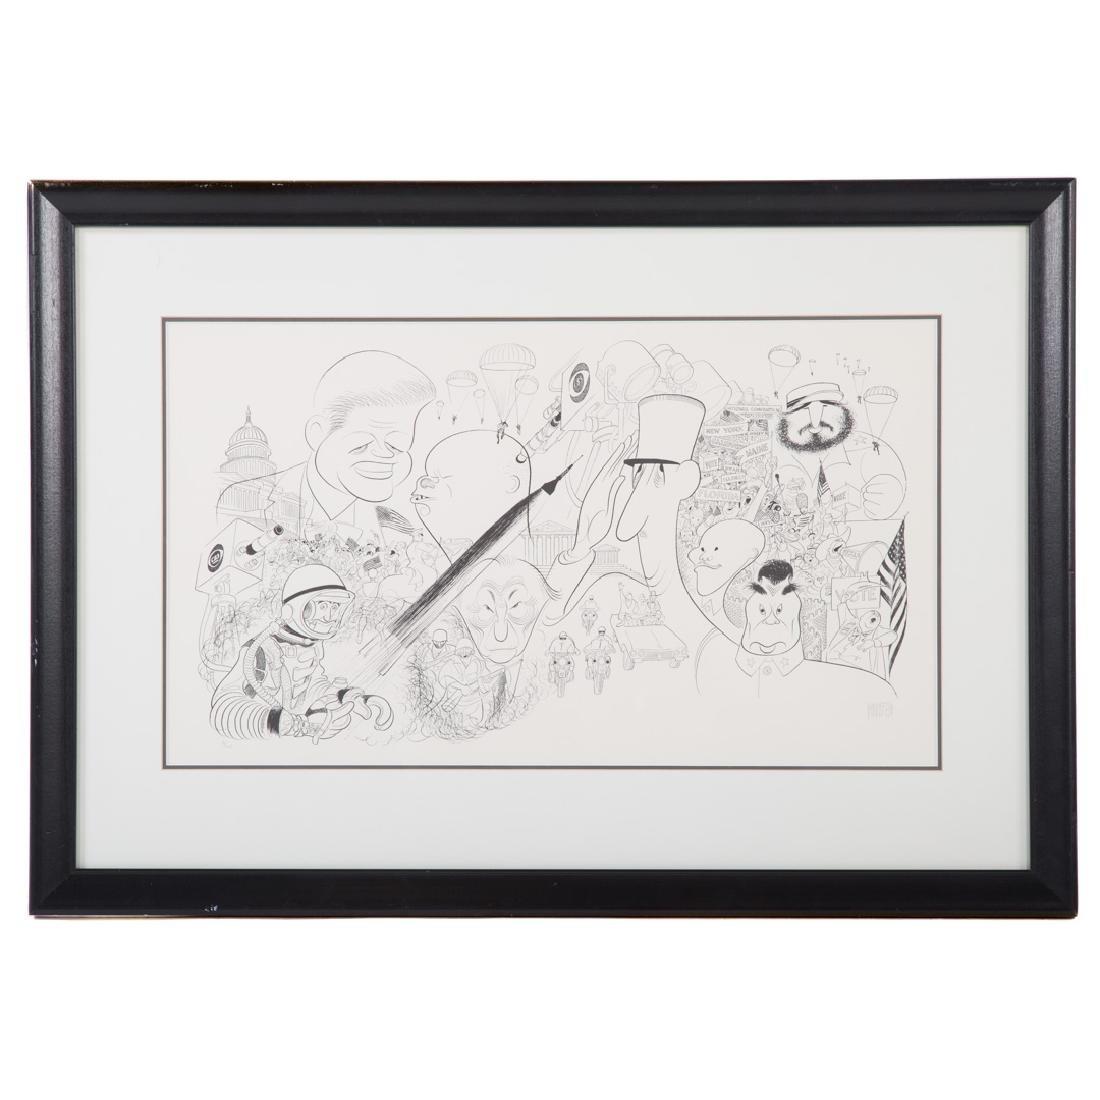 "Al Hirschfeld. ""The Kennedy Years,"" lithograph"